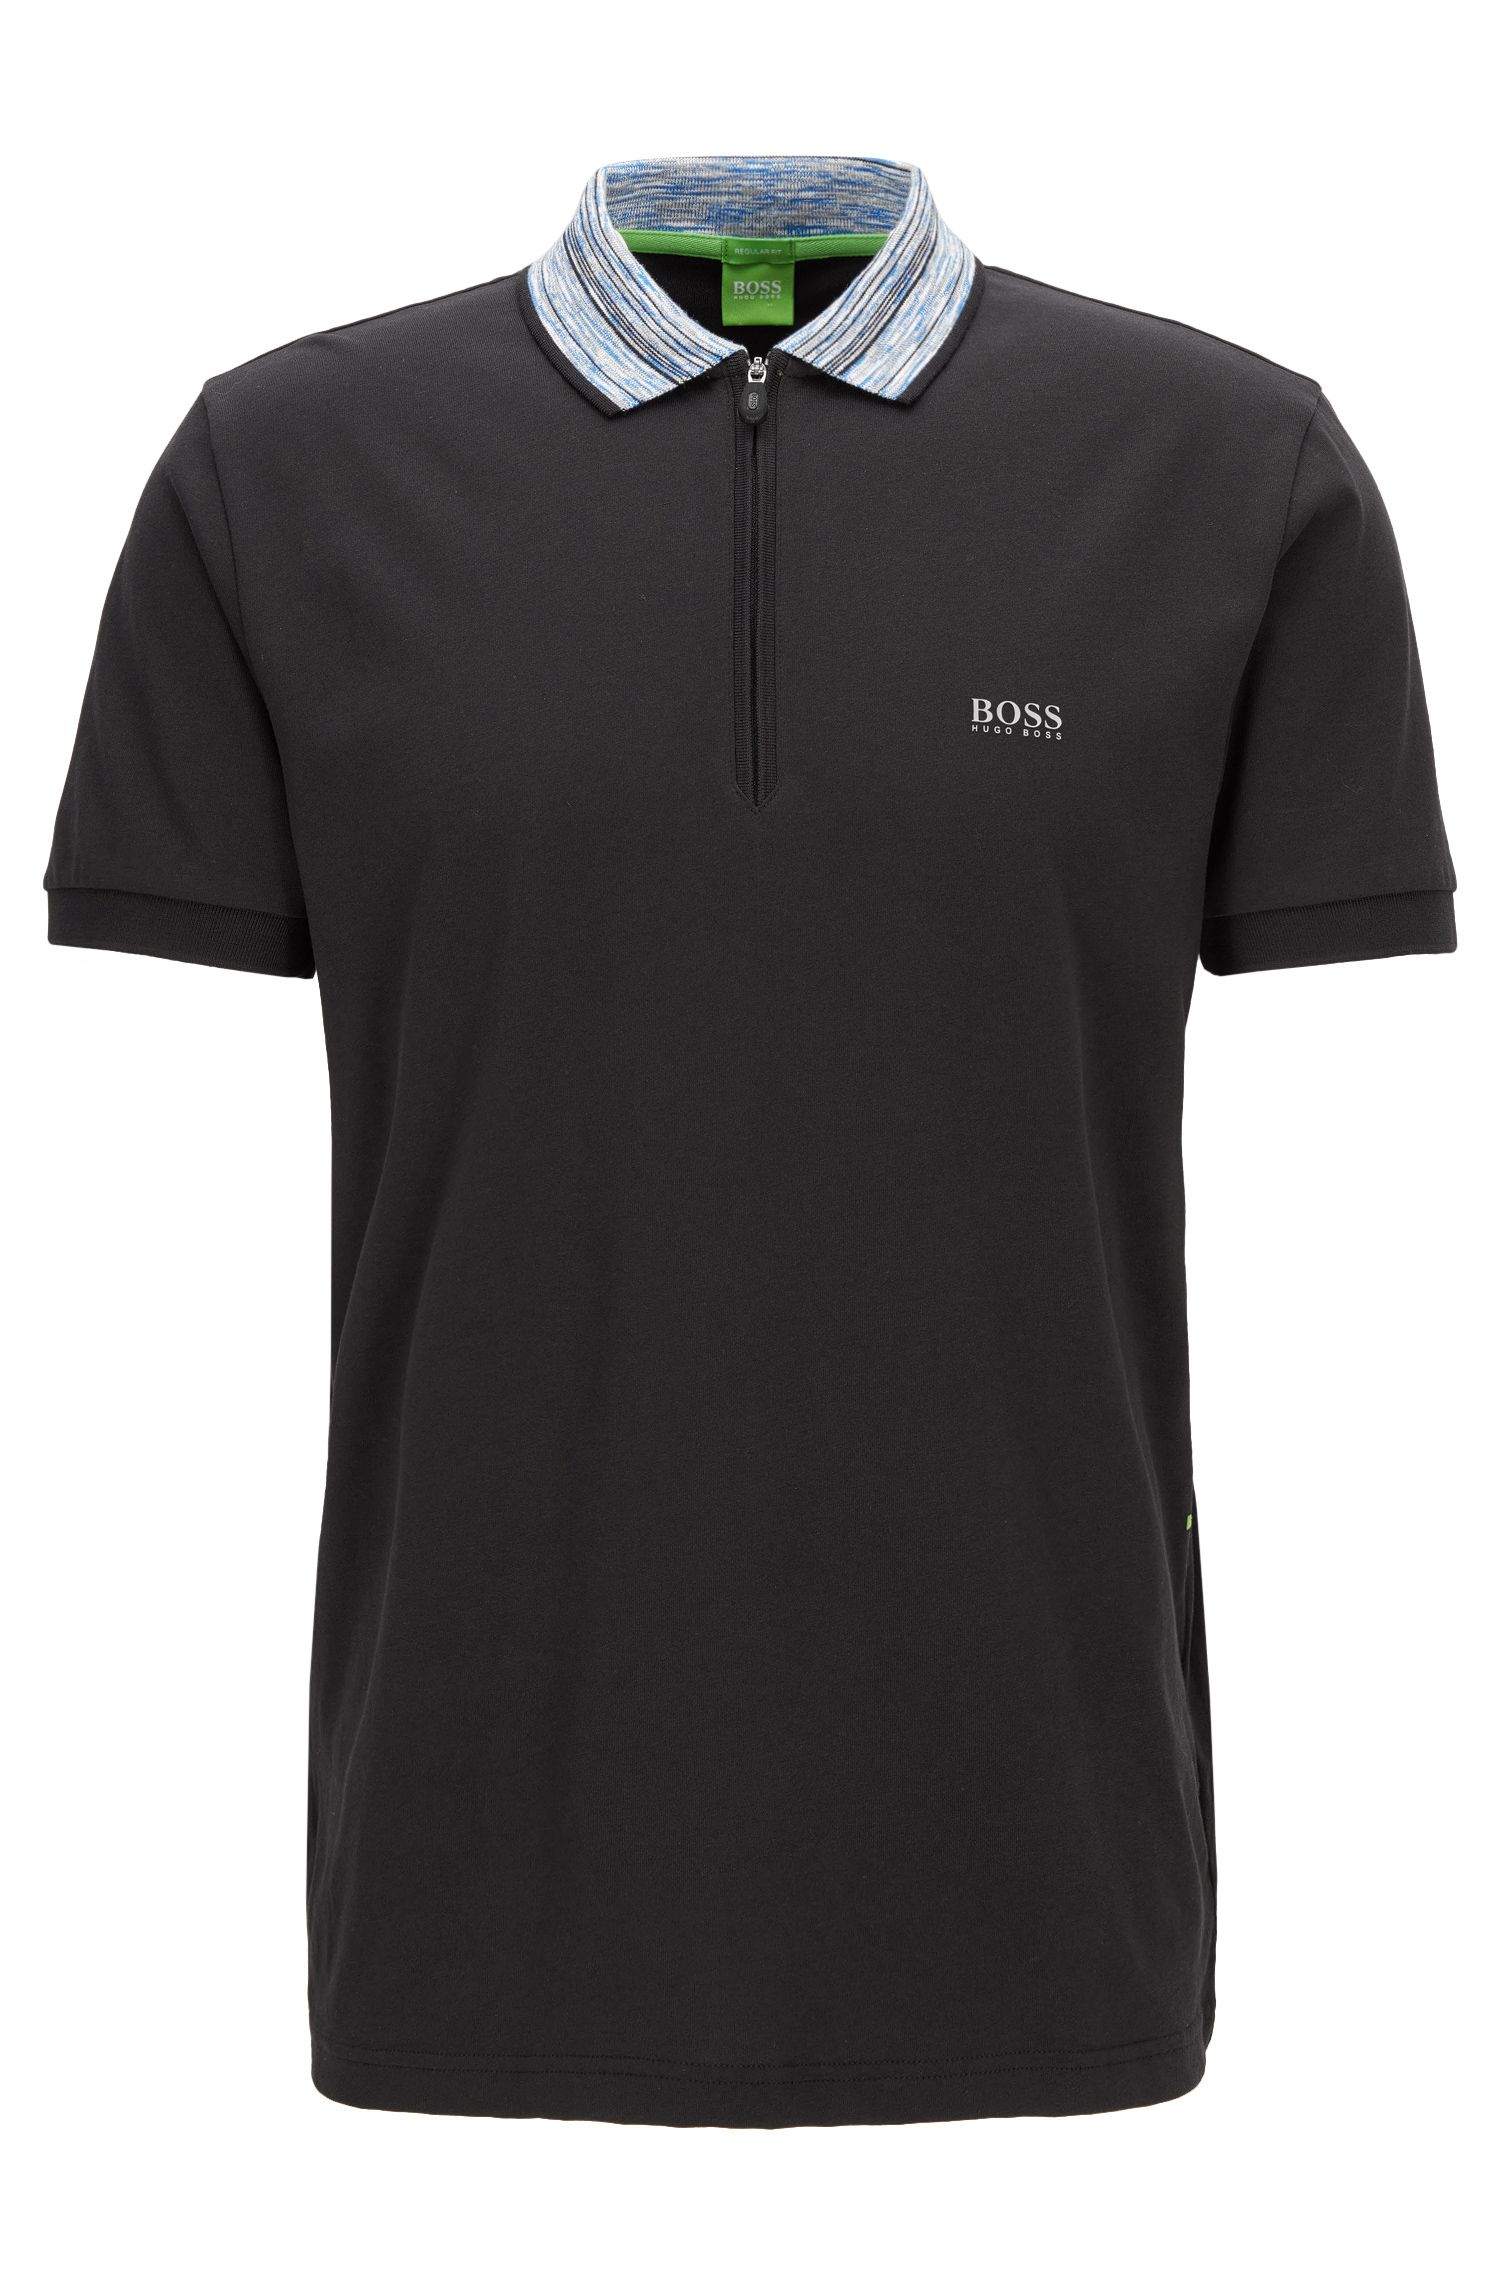 Cotton Blend Contrast Stripe Polo Shirt, Modern Fit | Philix